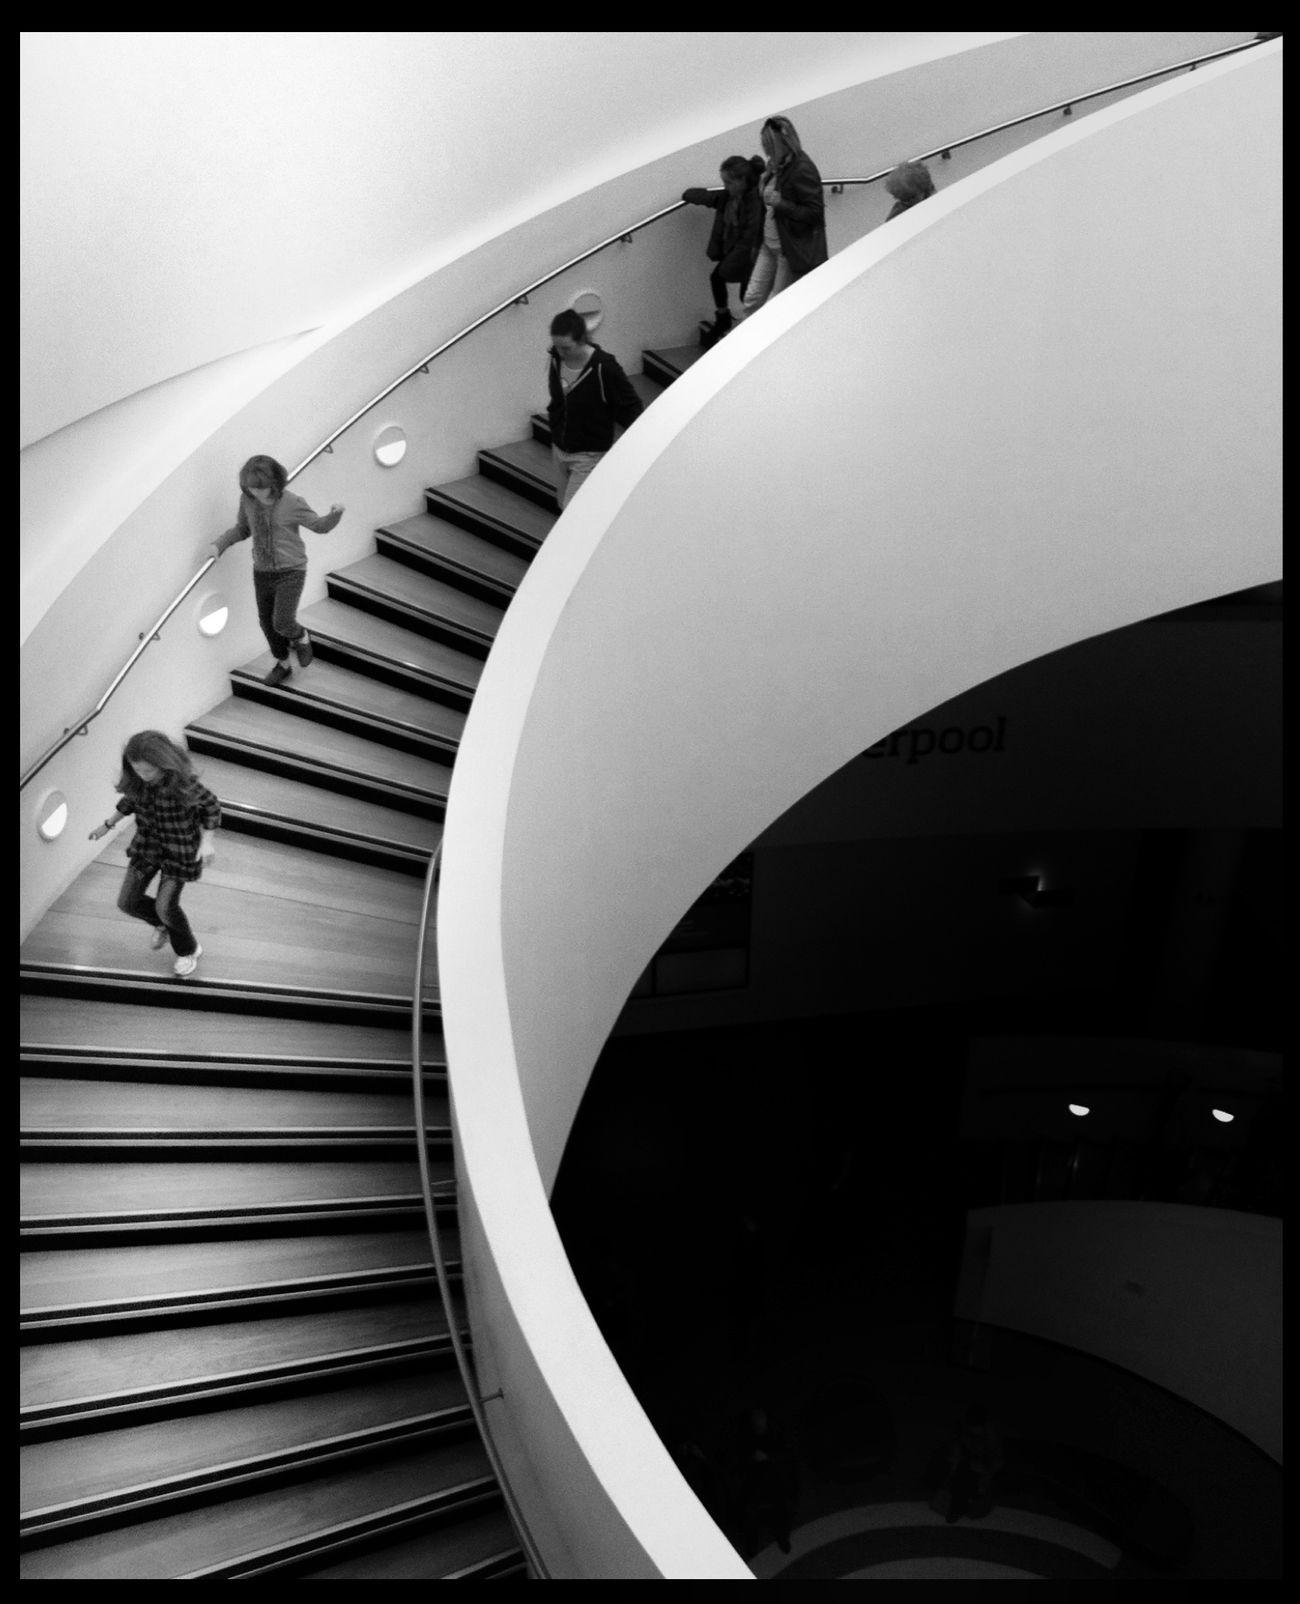 Architecture Eyeforphotography Monochrome Shootermag Mono Blackandwhite